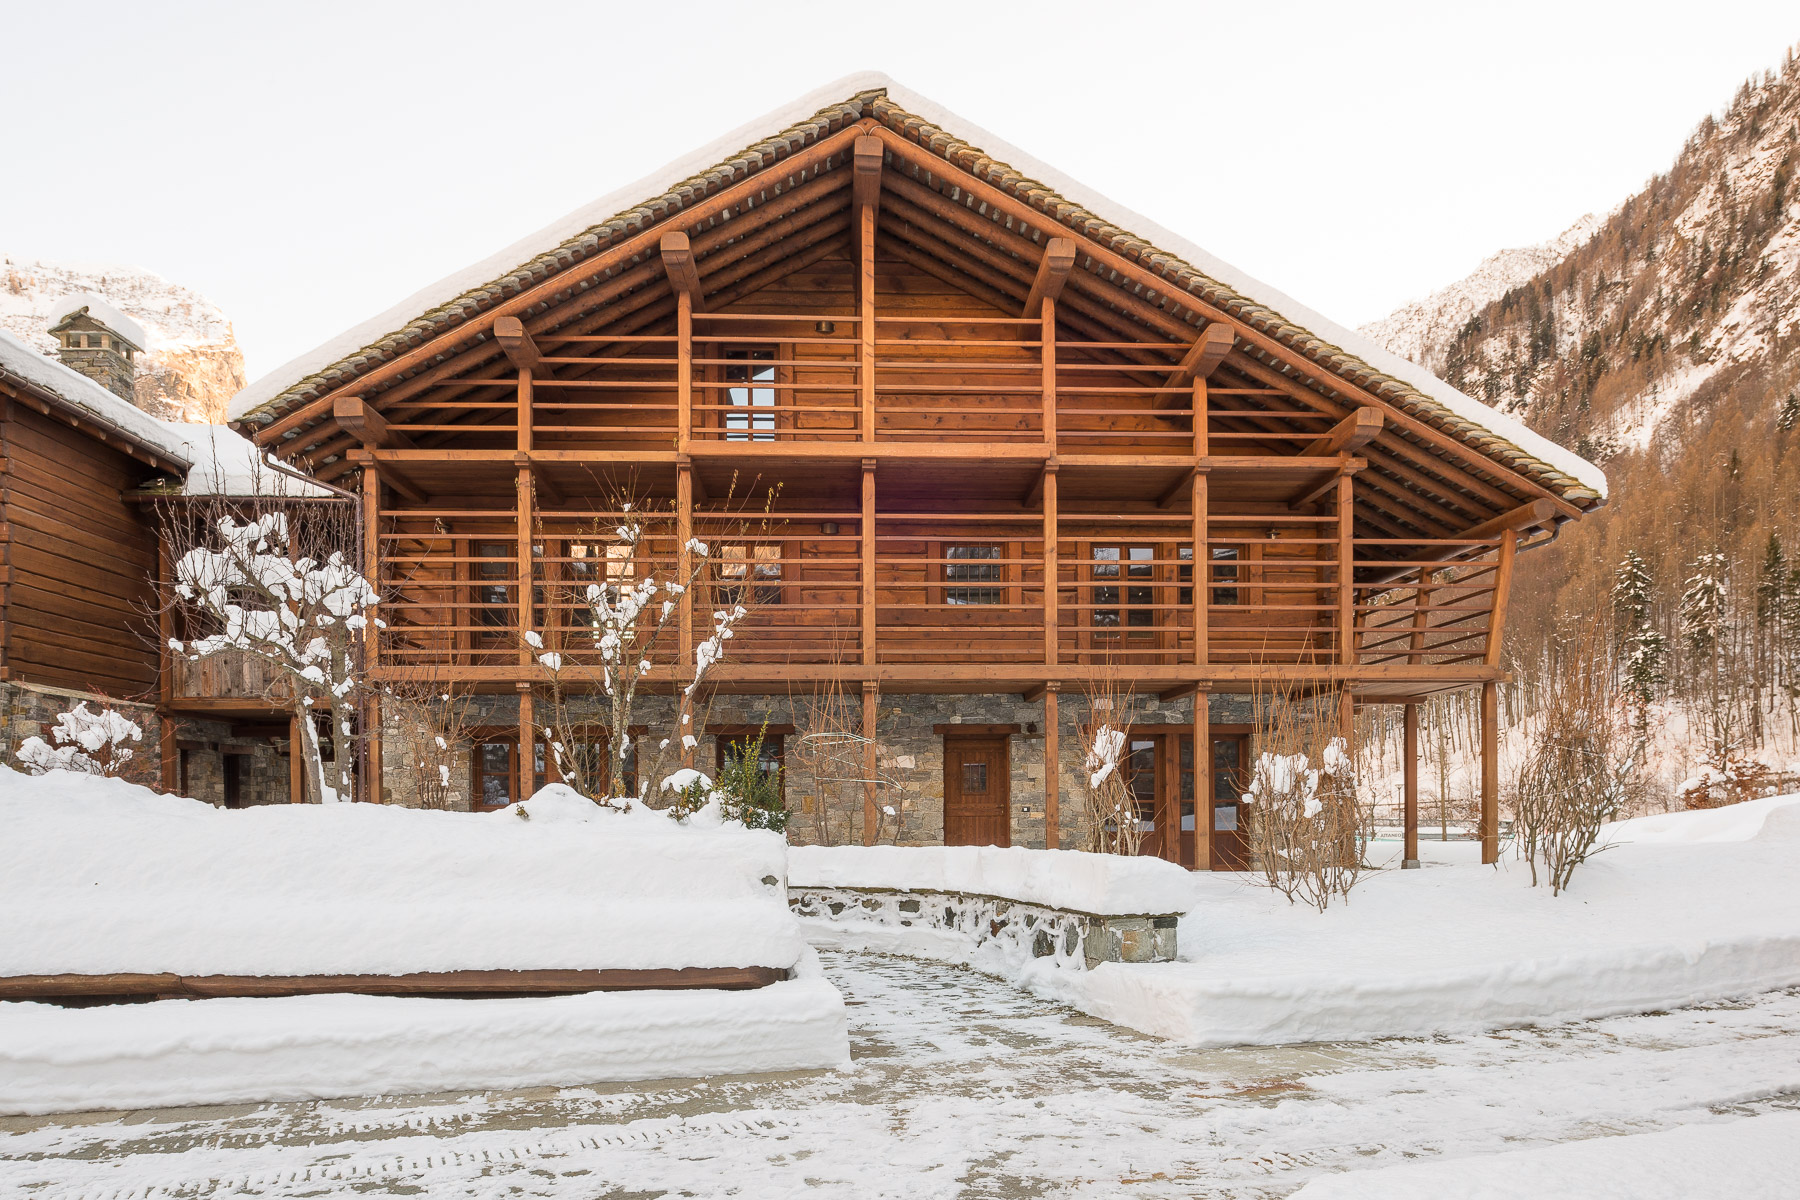 Villa in Vendita a Alagna Valsesia: 5 locali, 300 mq